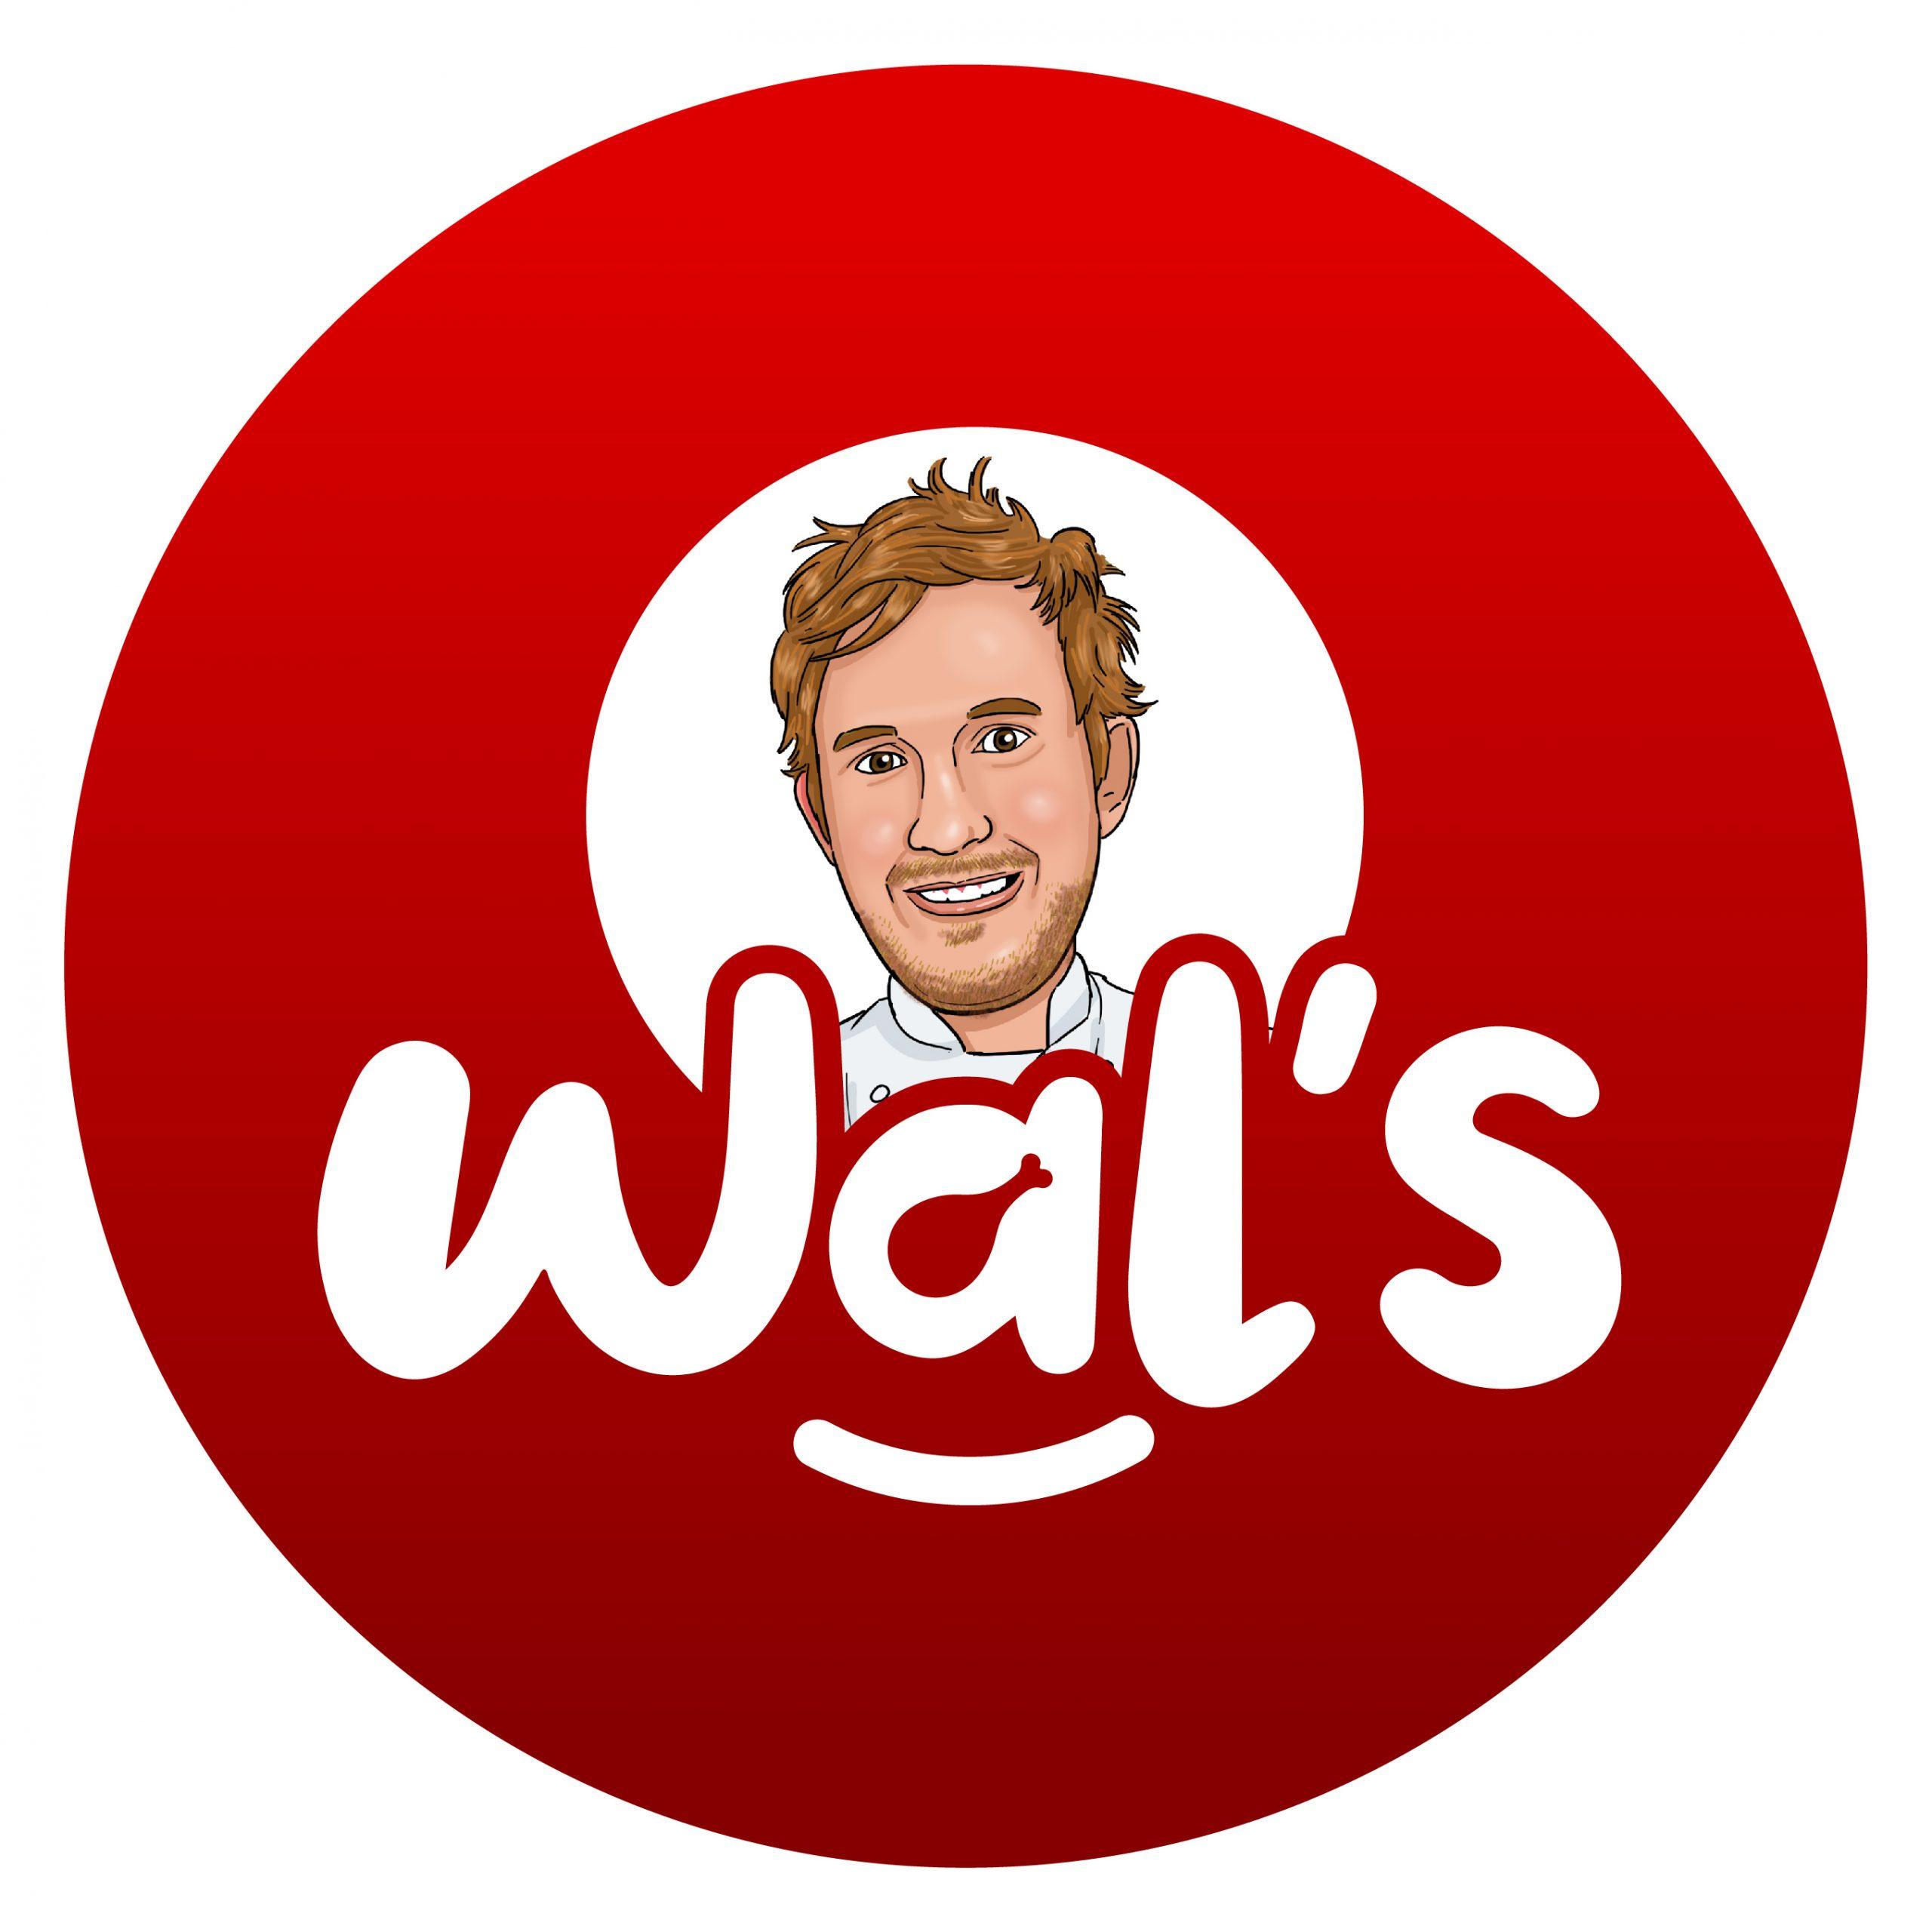 Wal's Takeaway